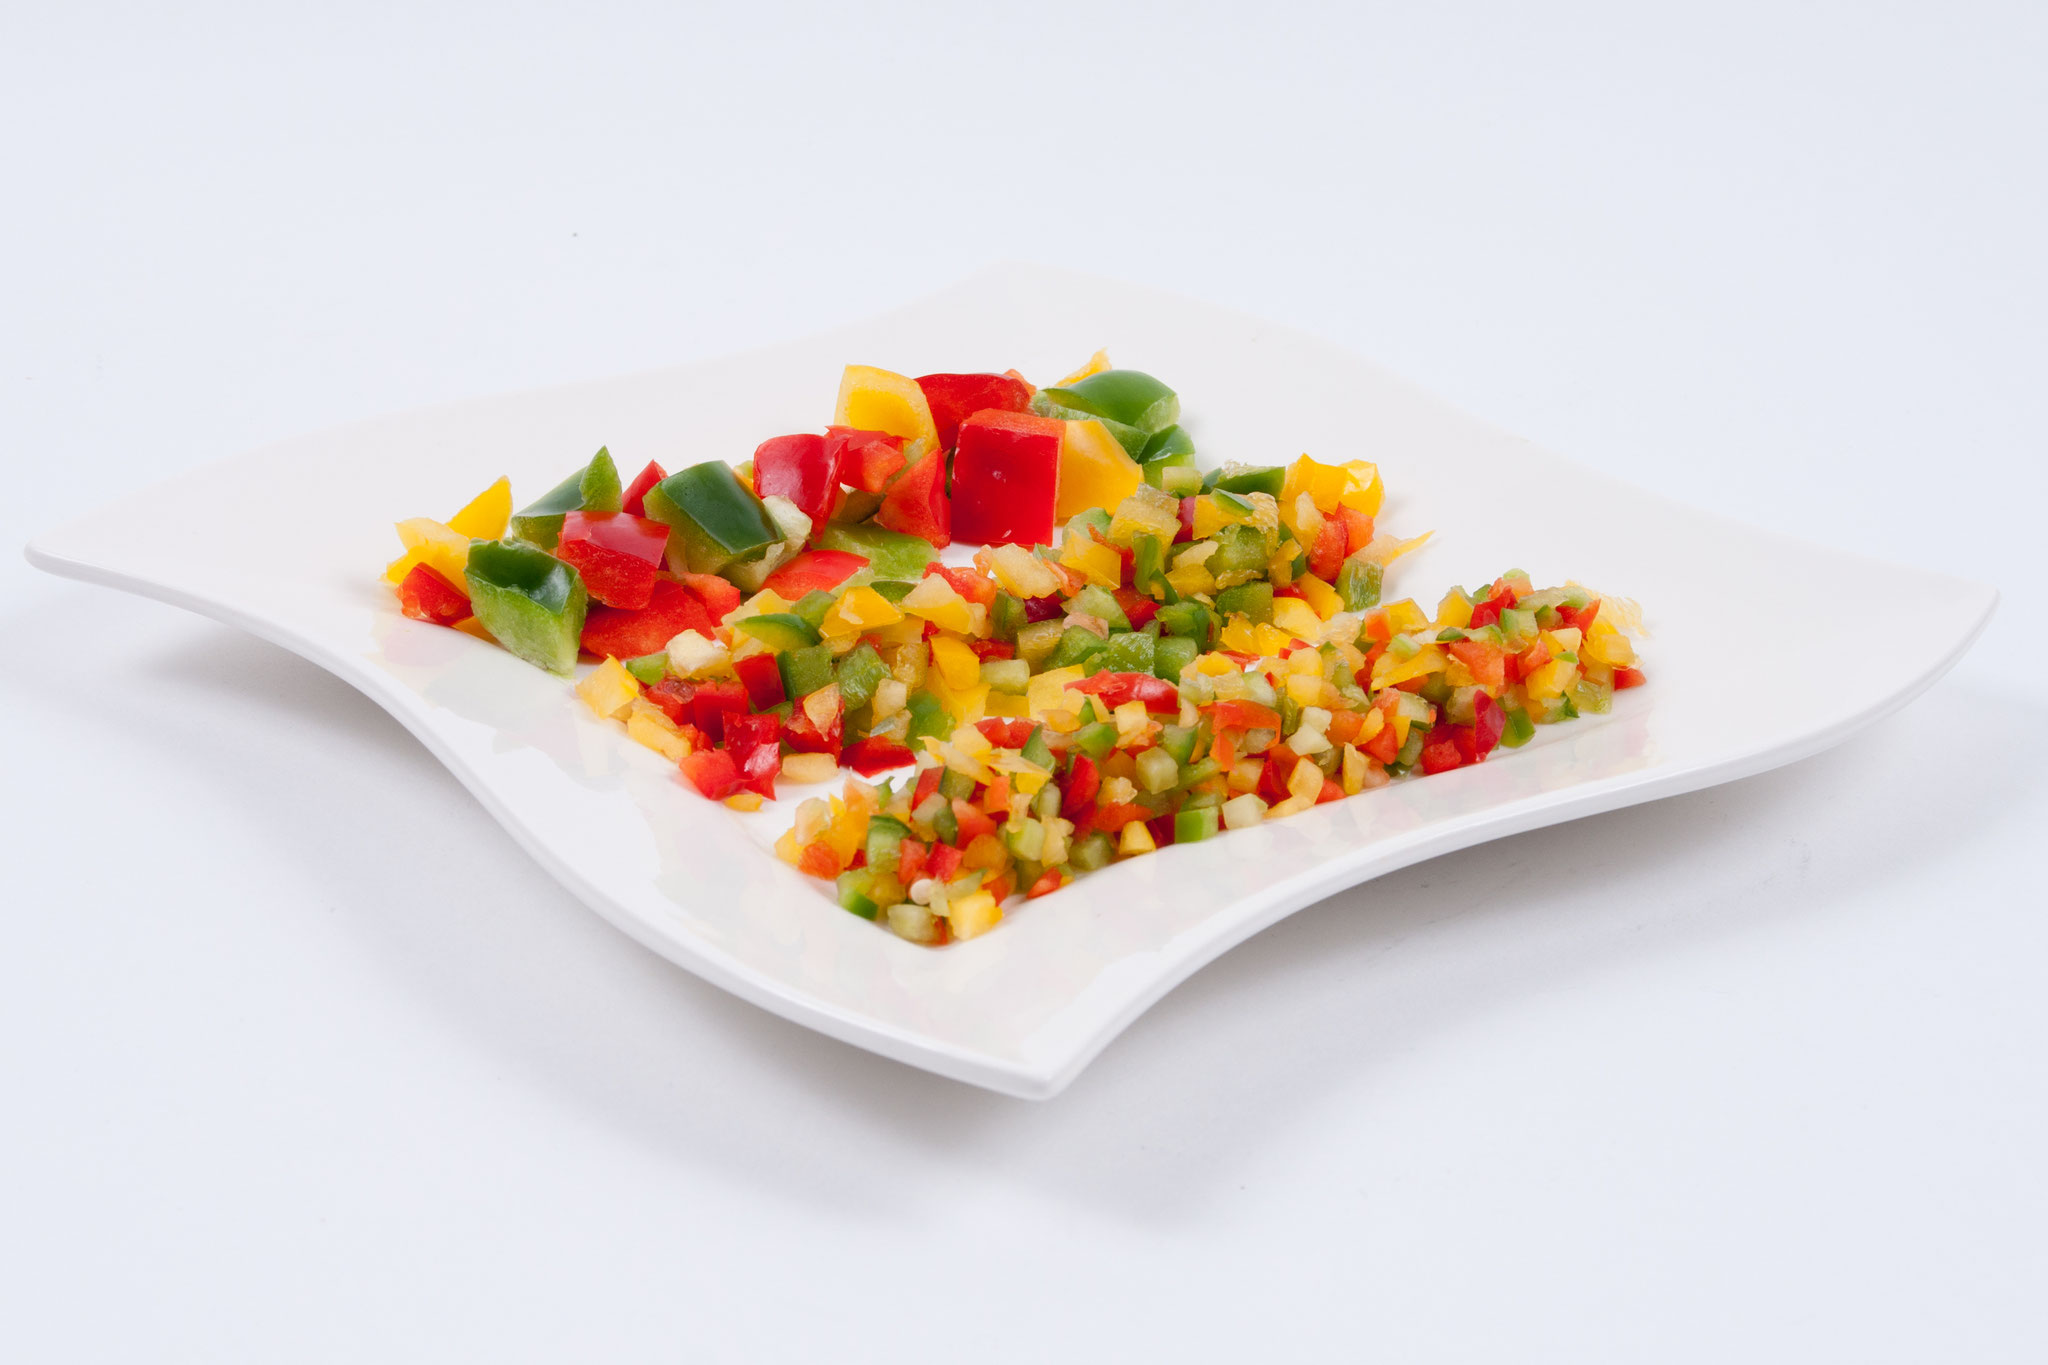 Paprika gemischt 2-3-5 mm - Würfel